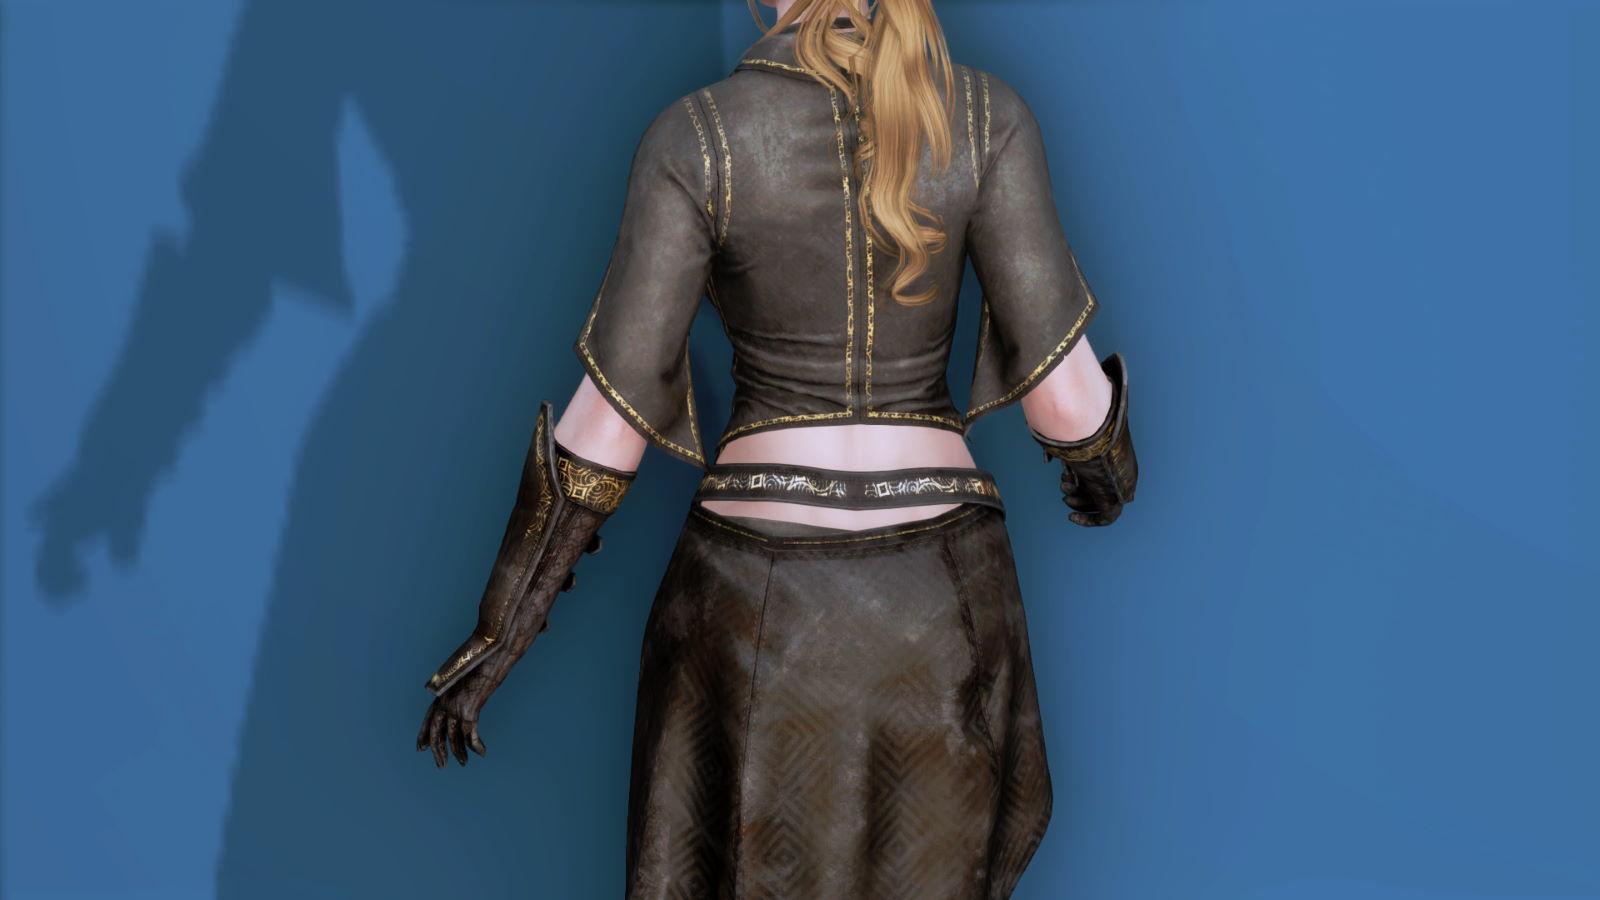 RuggedRogueSSE 123-1 Pose Up-Ba-F Blouse Skirt W 1